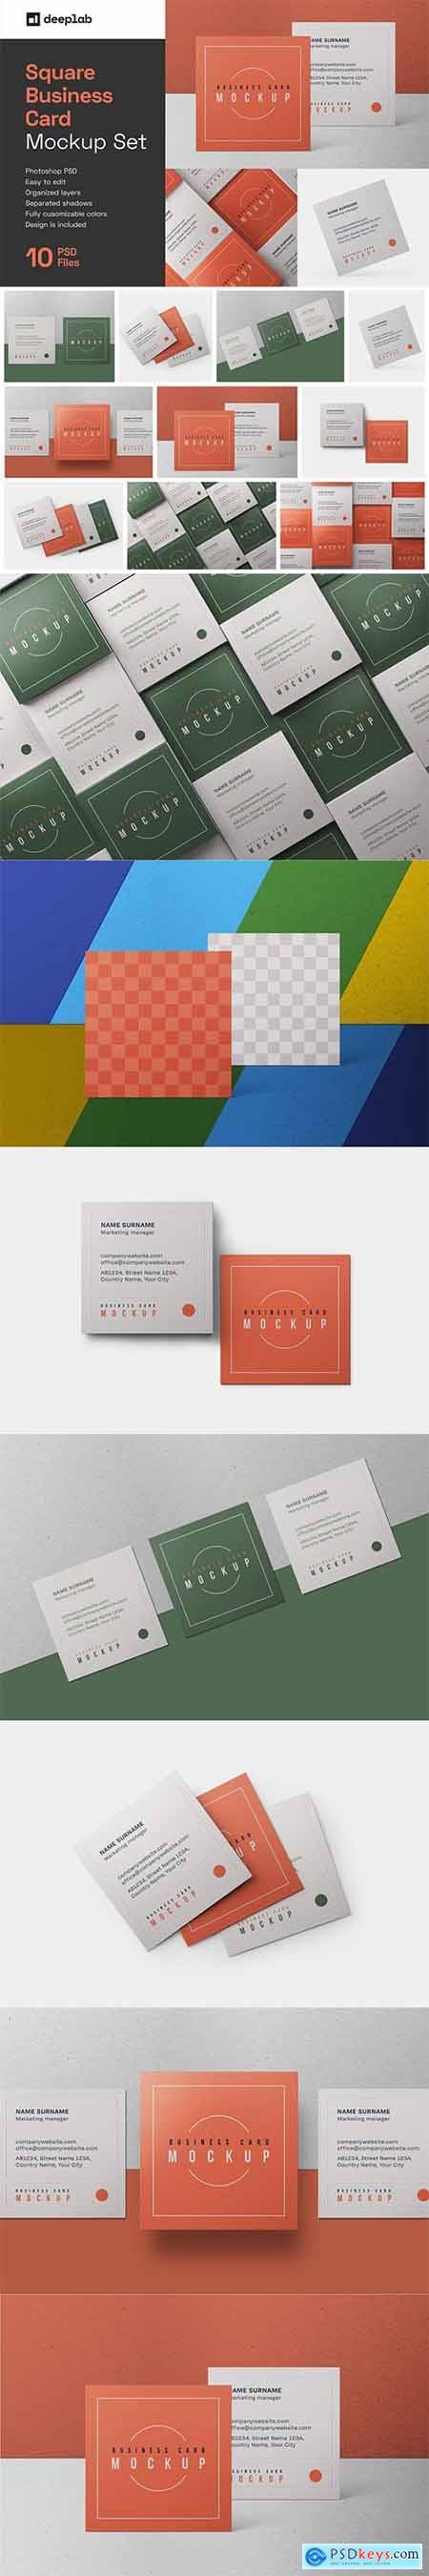 Square Business Card Mockup Set 6091259